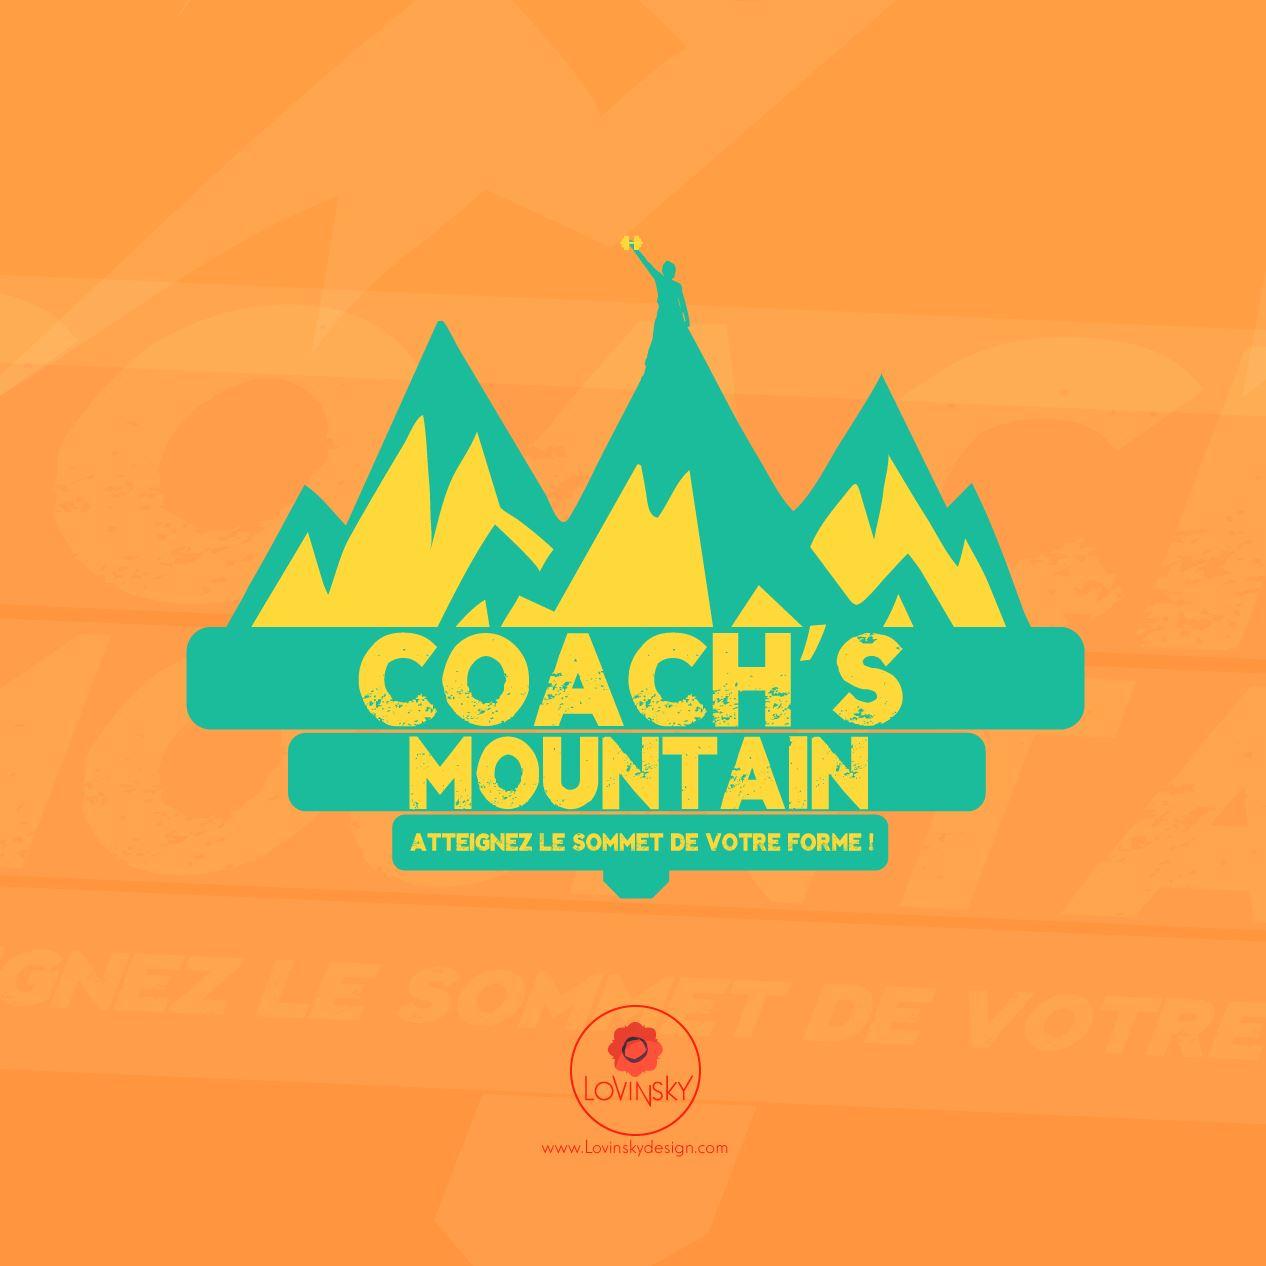 coachs-mountainlogo lovinsky graphiste webdesigner freelance nantes 44